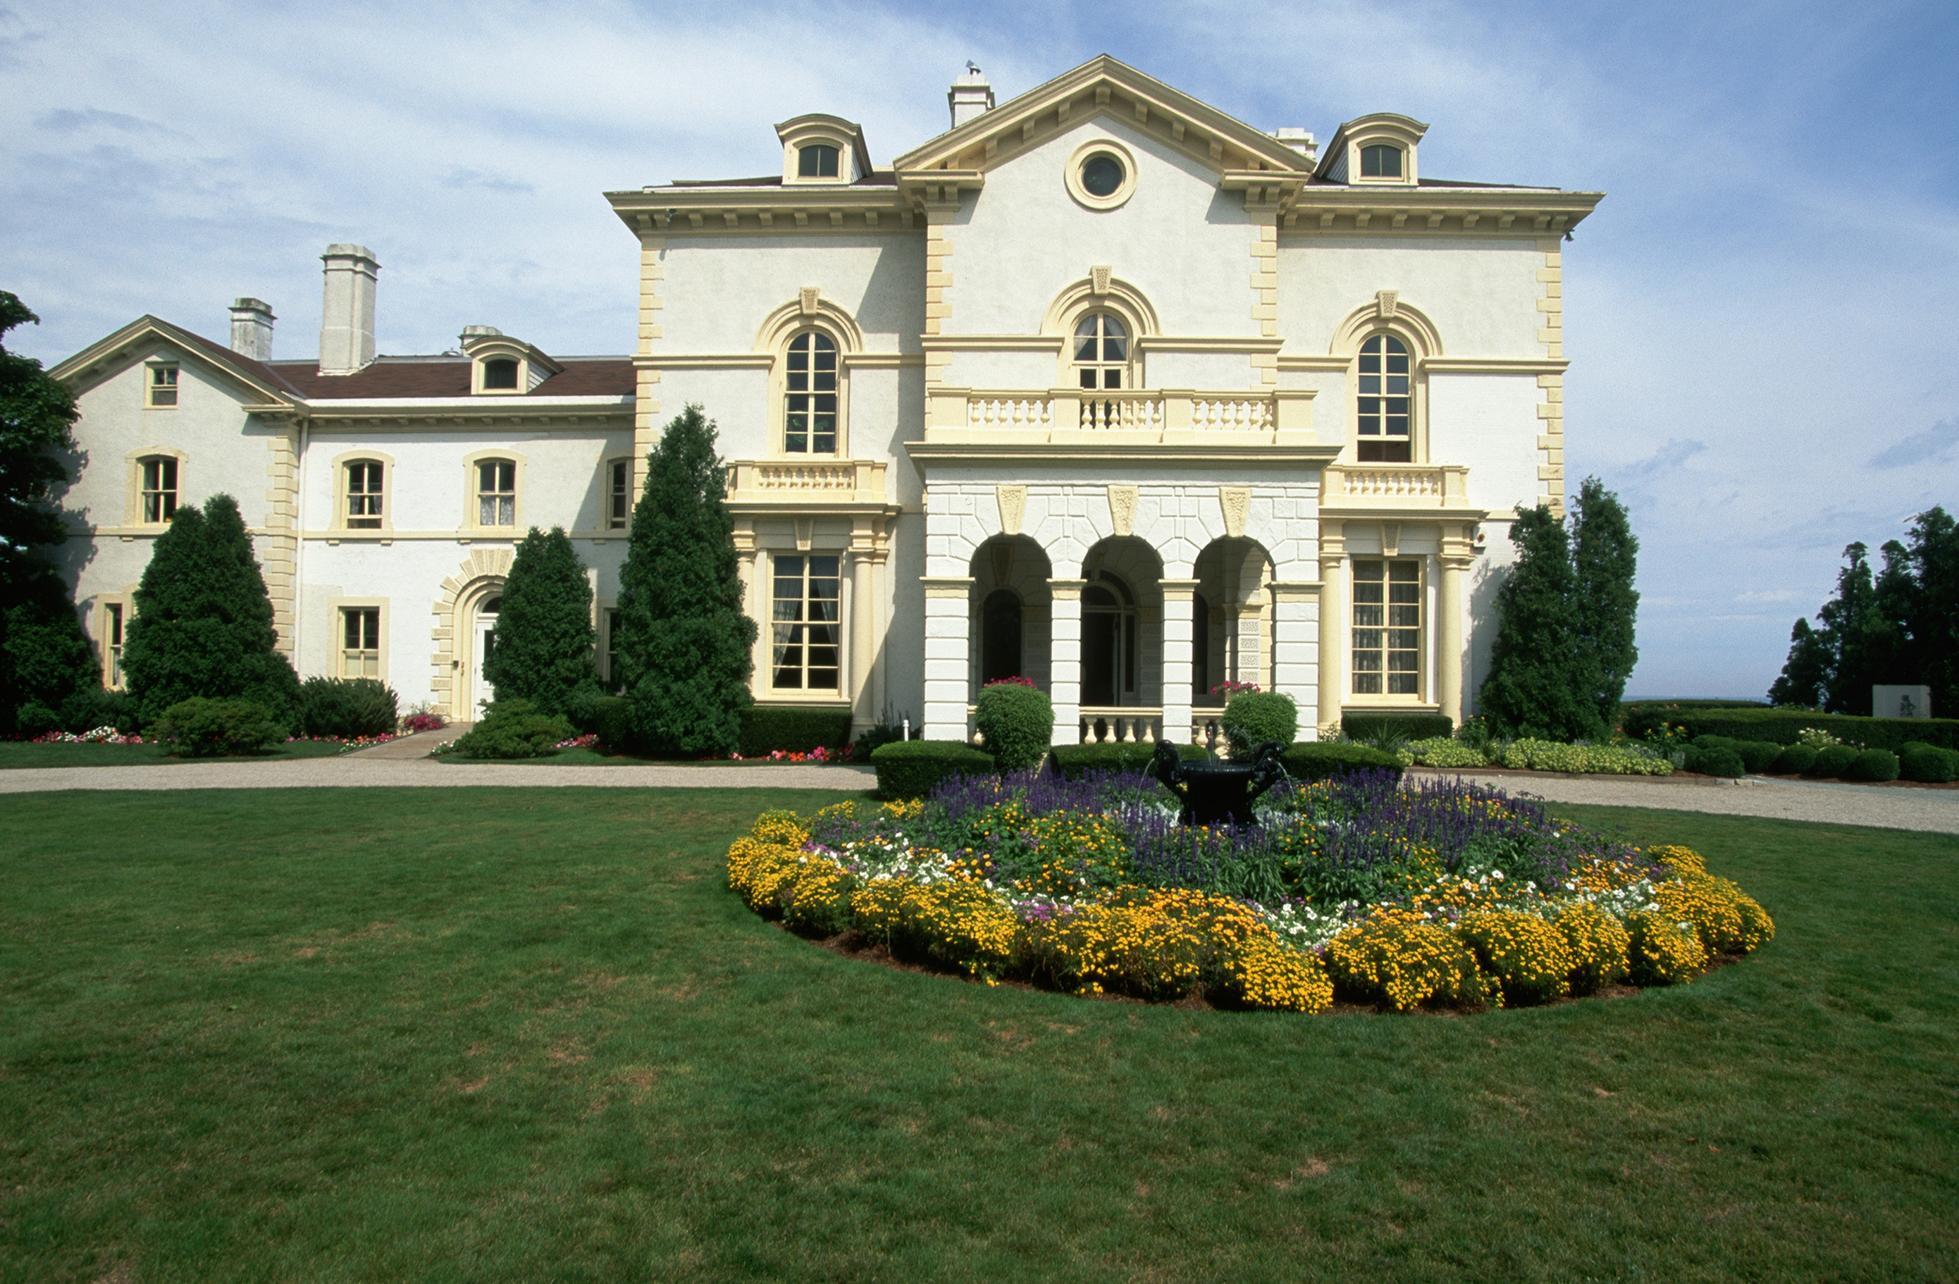 Astor's Beechwood Mansion